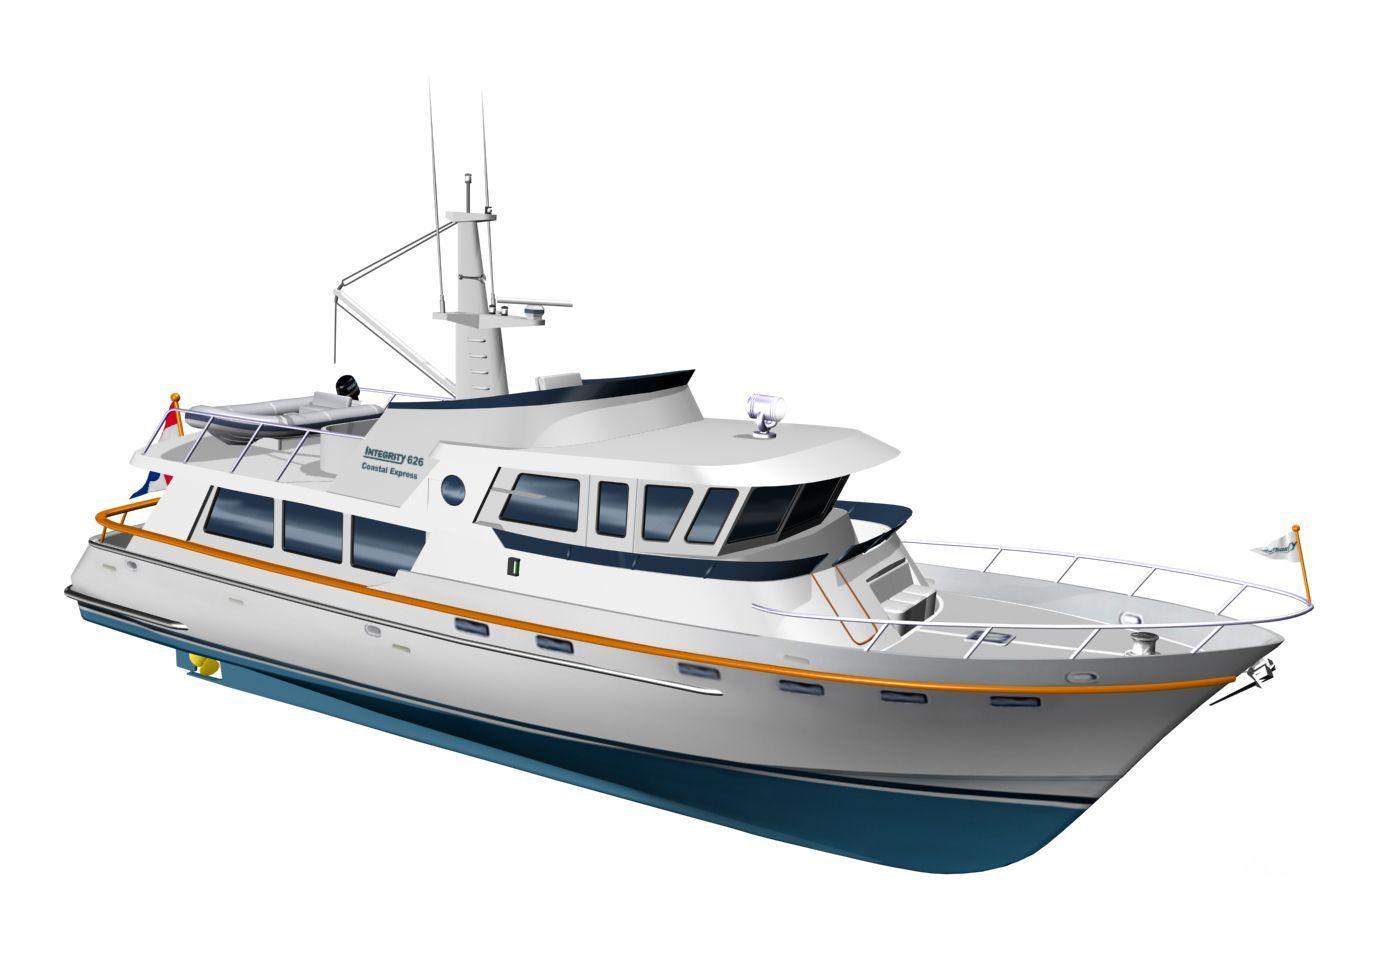 2020 Goldwater 65 CE Trawler Power Boat For Sale - www ...